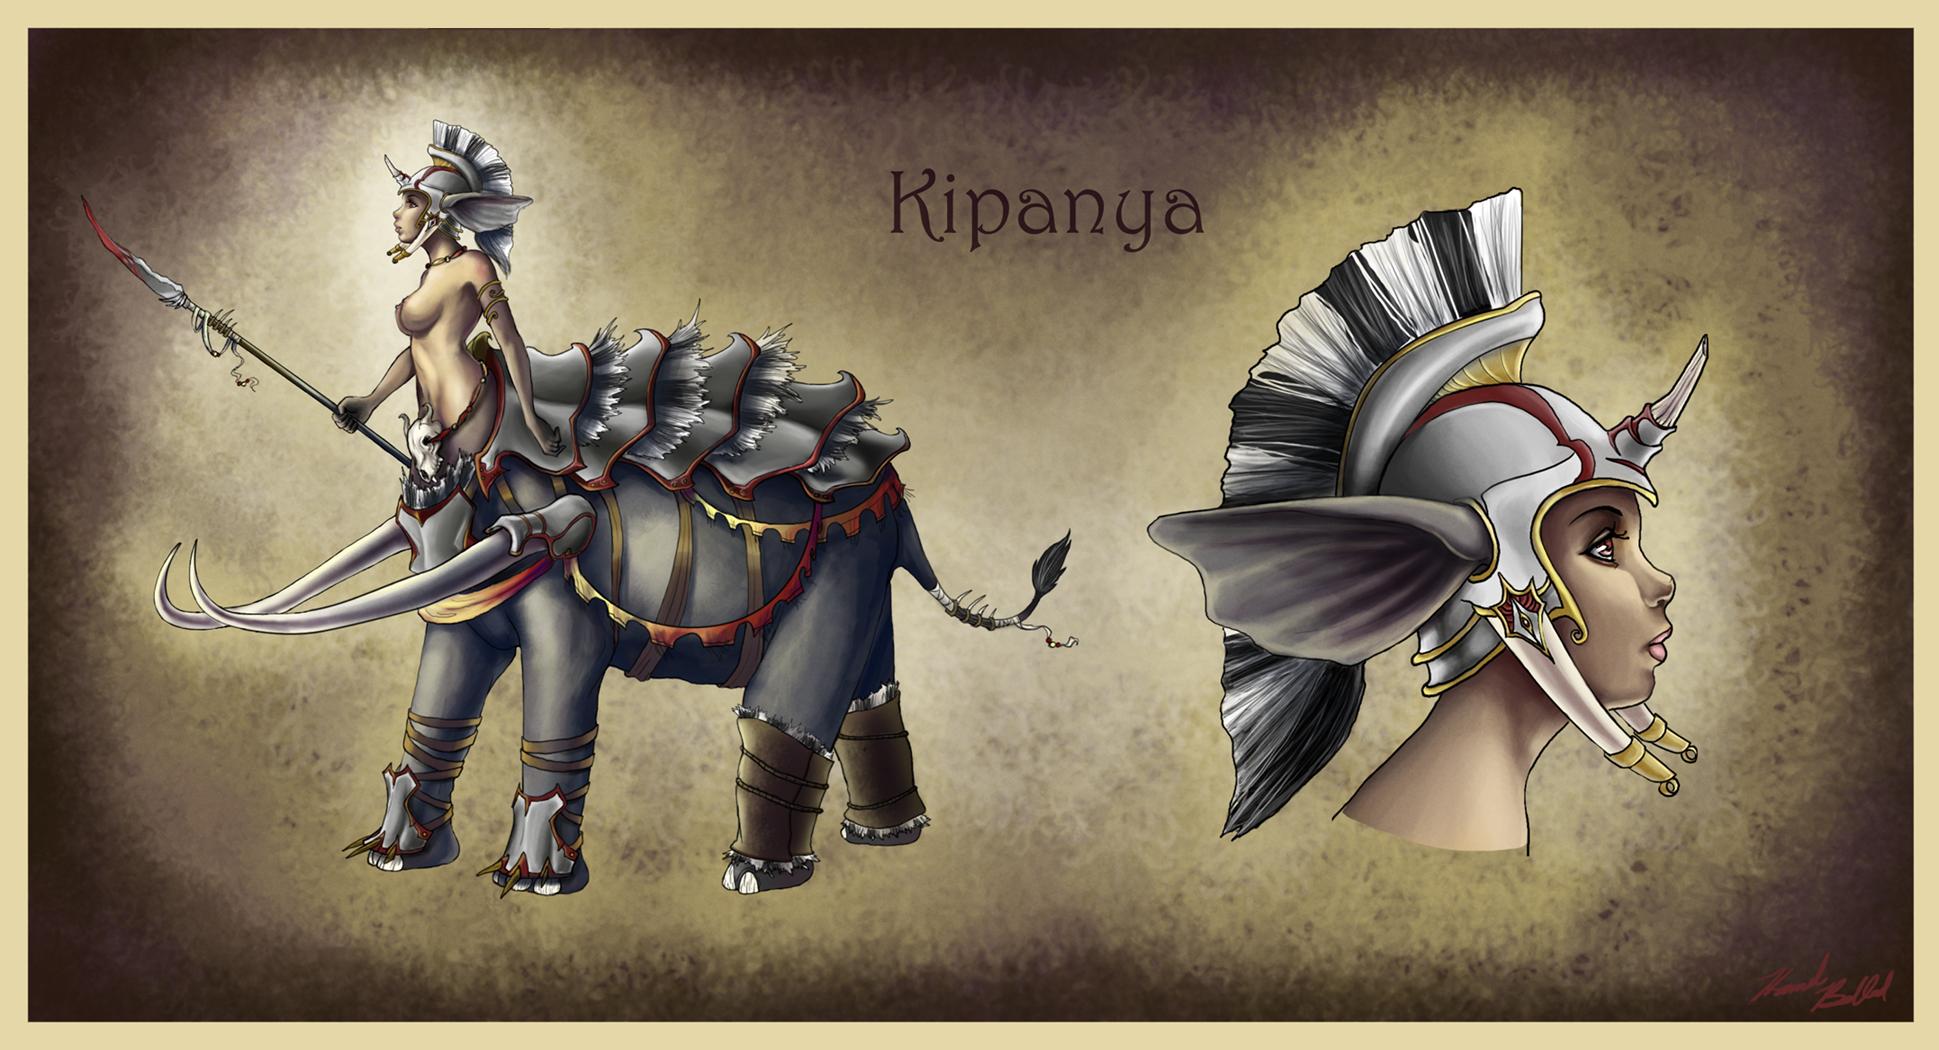 Kipanya ref